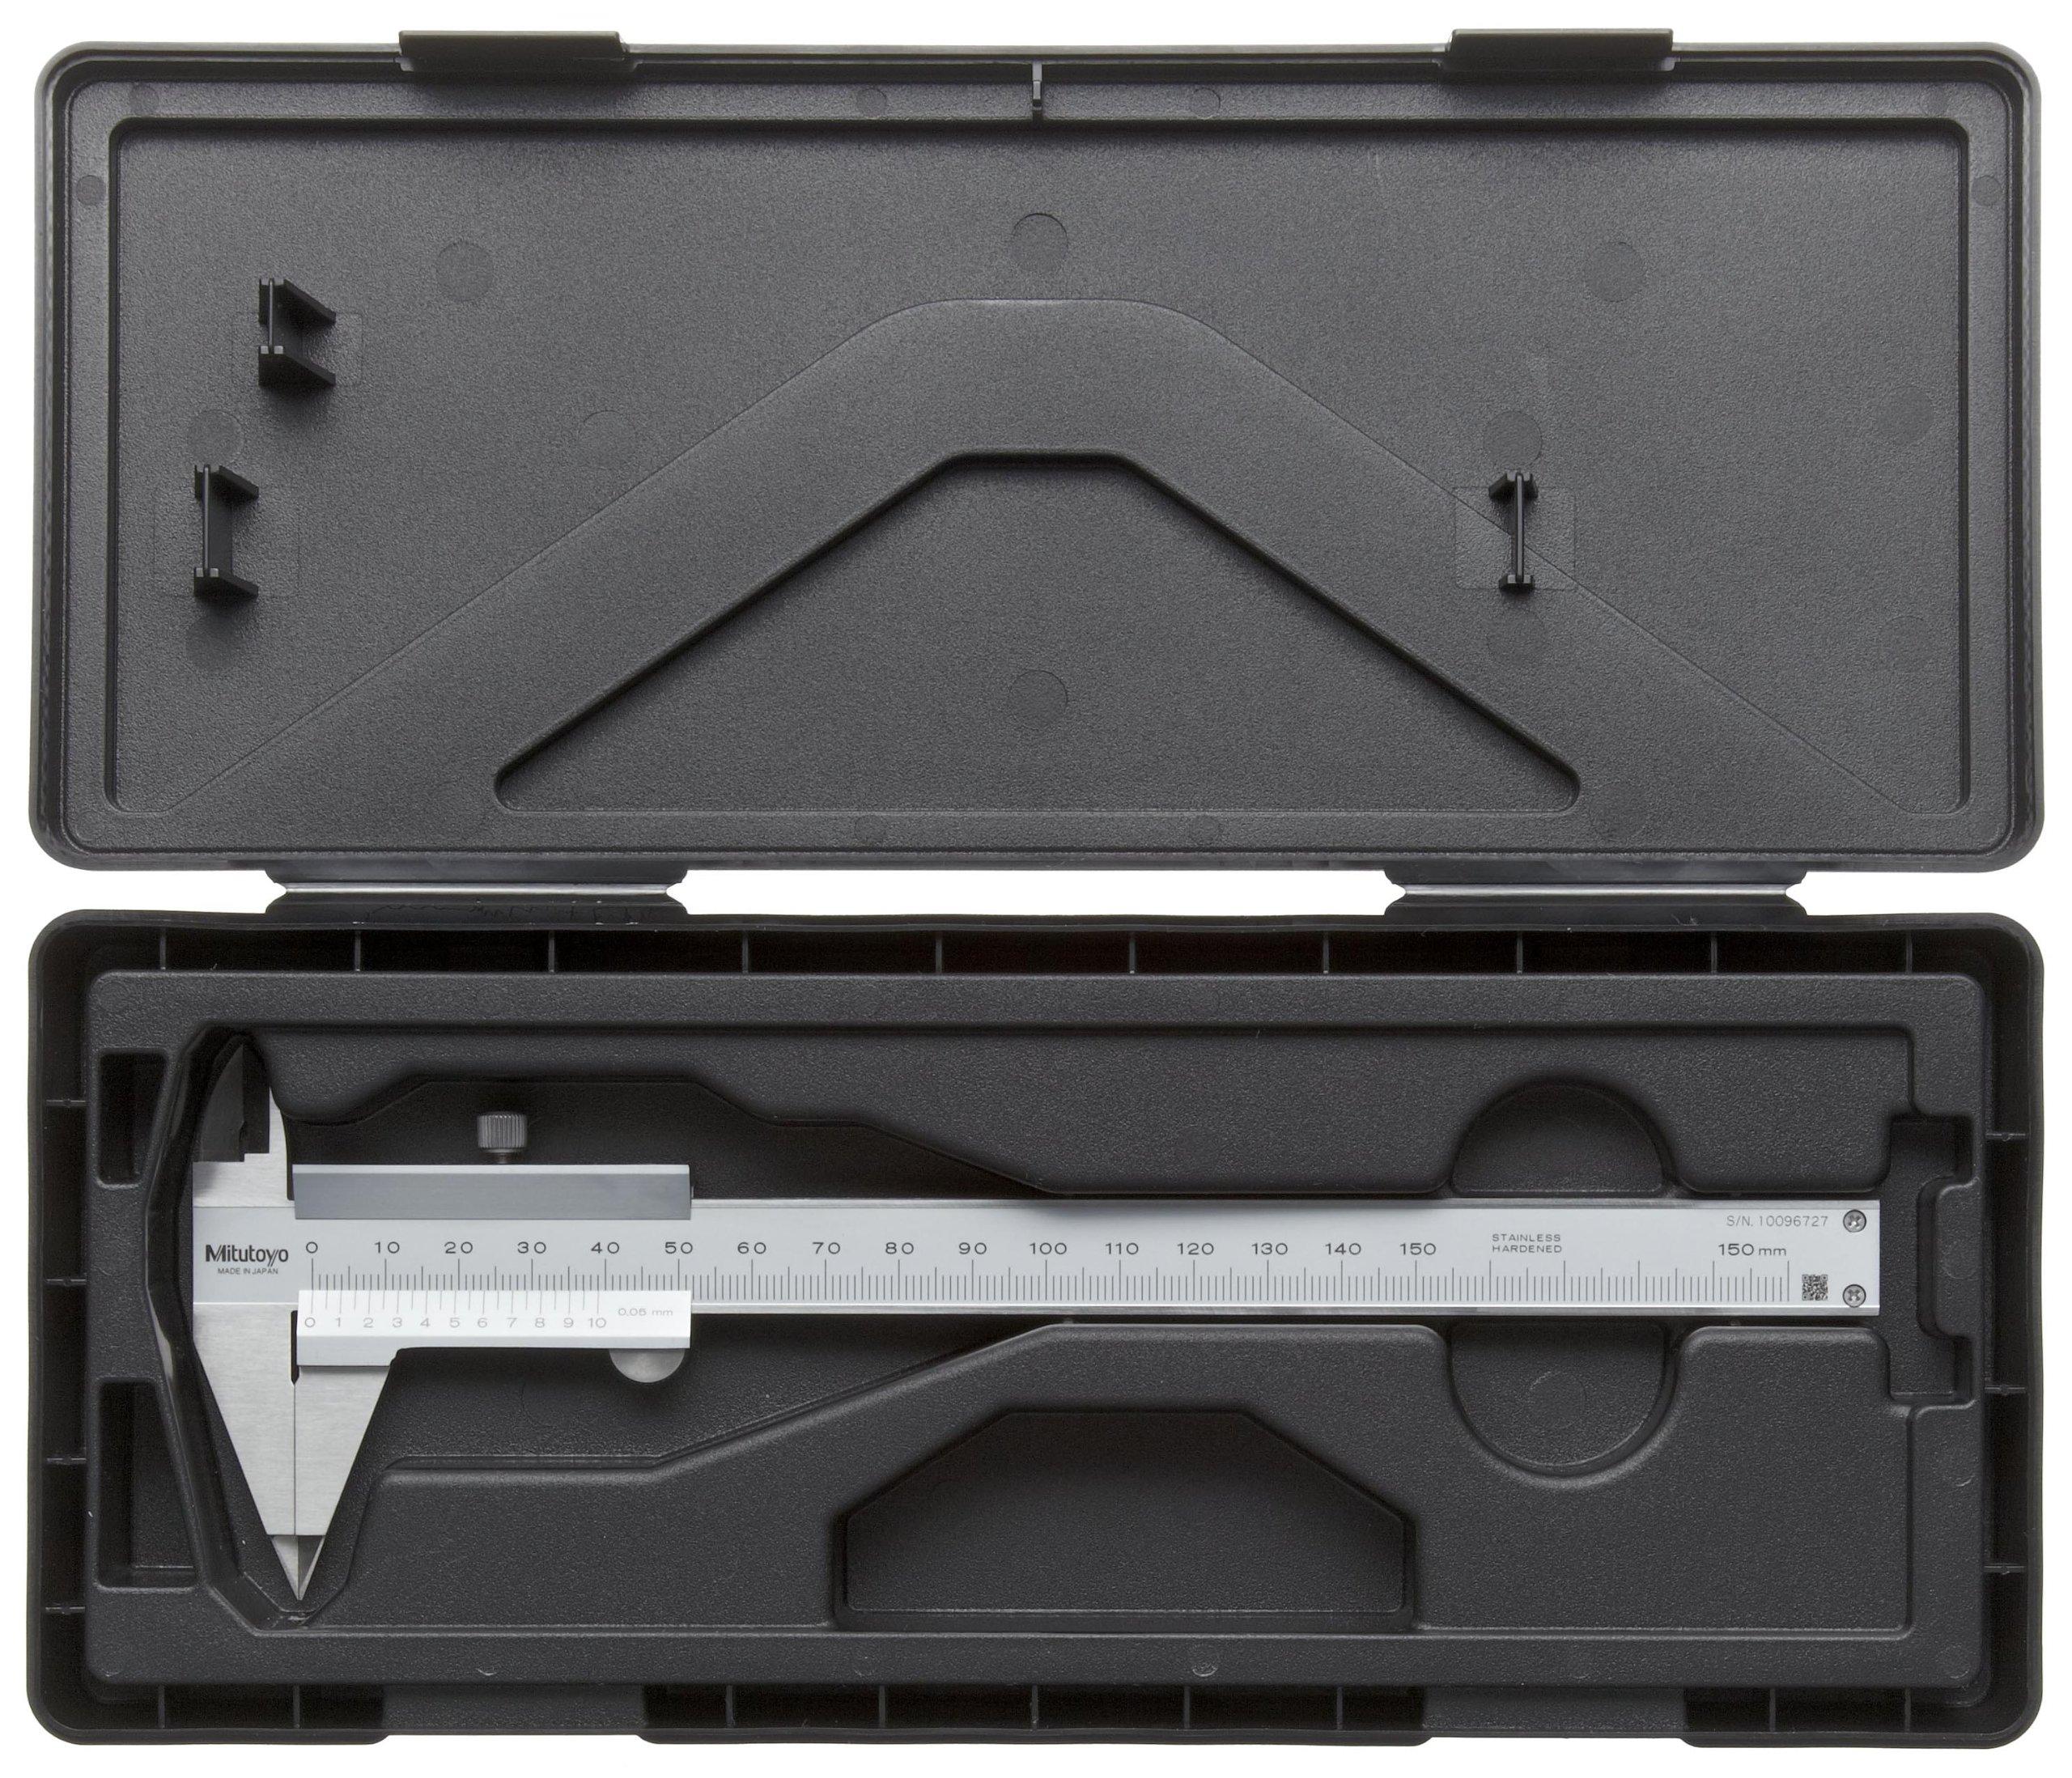 Mitutoyo 536-121 Vernier Caliper, Stainless Steel, Narrow Tip Jaw, 0-150mm Range, +/-0.05mm Accuracy, 0.05mm Resolution